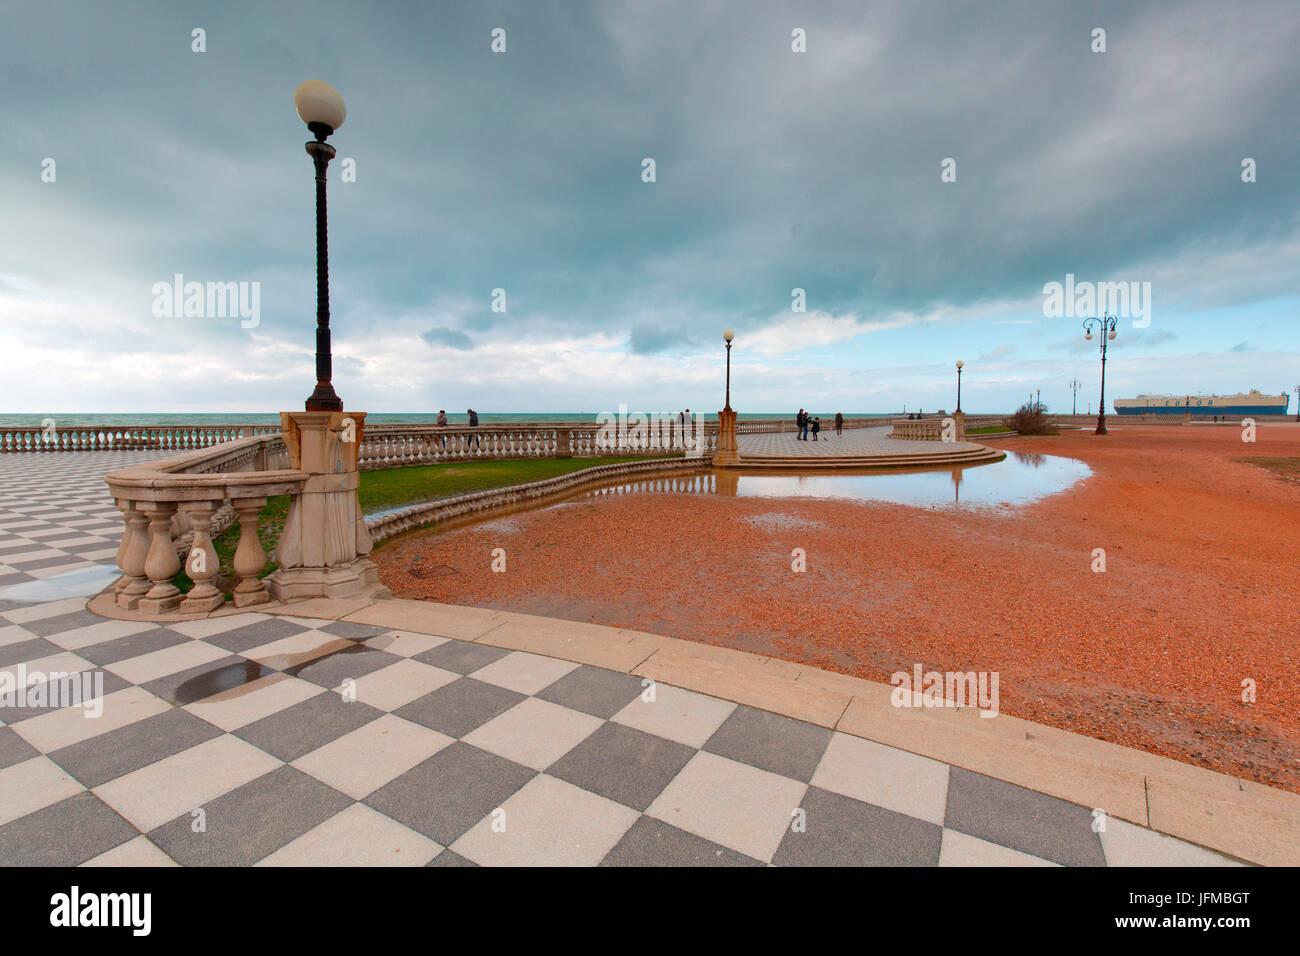 Europe, Italy, Tuscany, Livorno, Mascagni Terrace - Stock Image